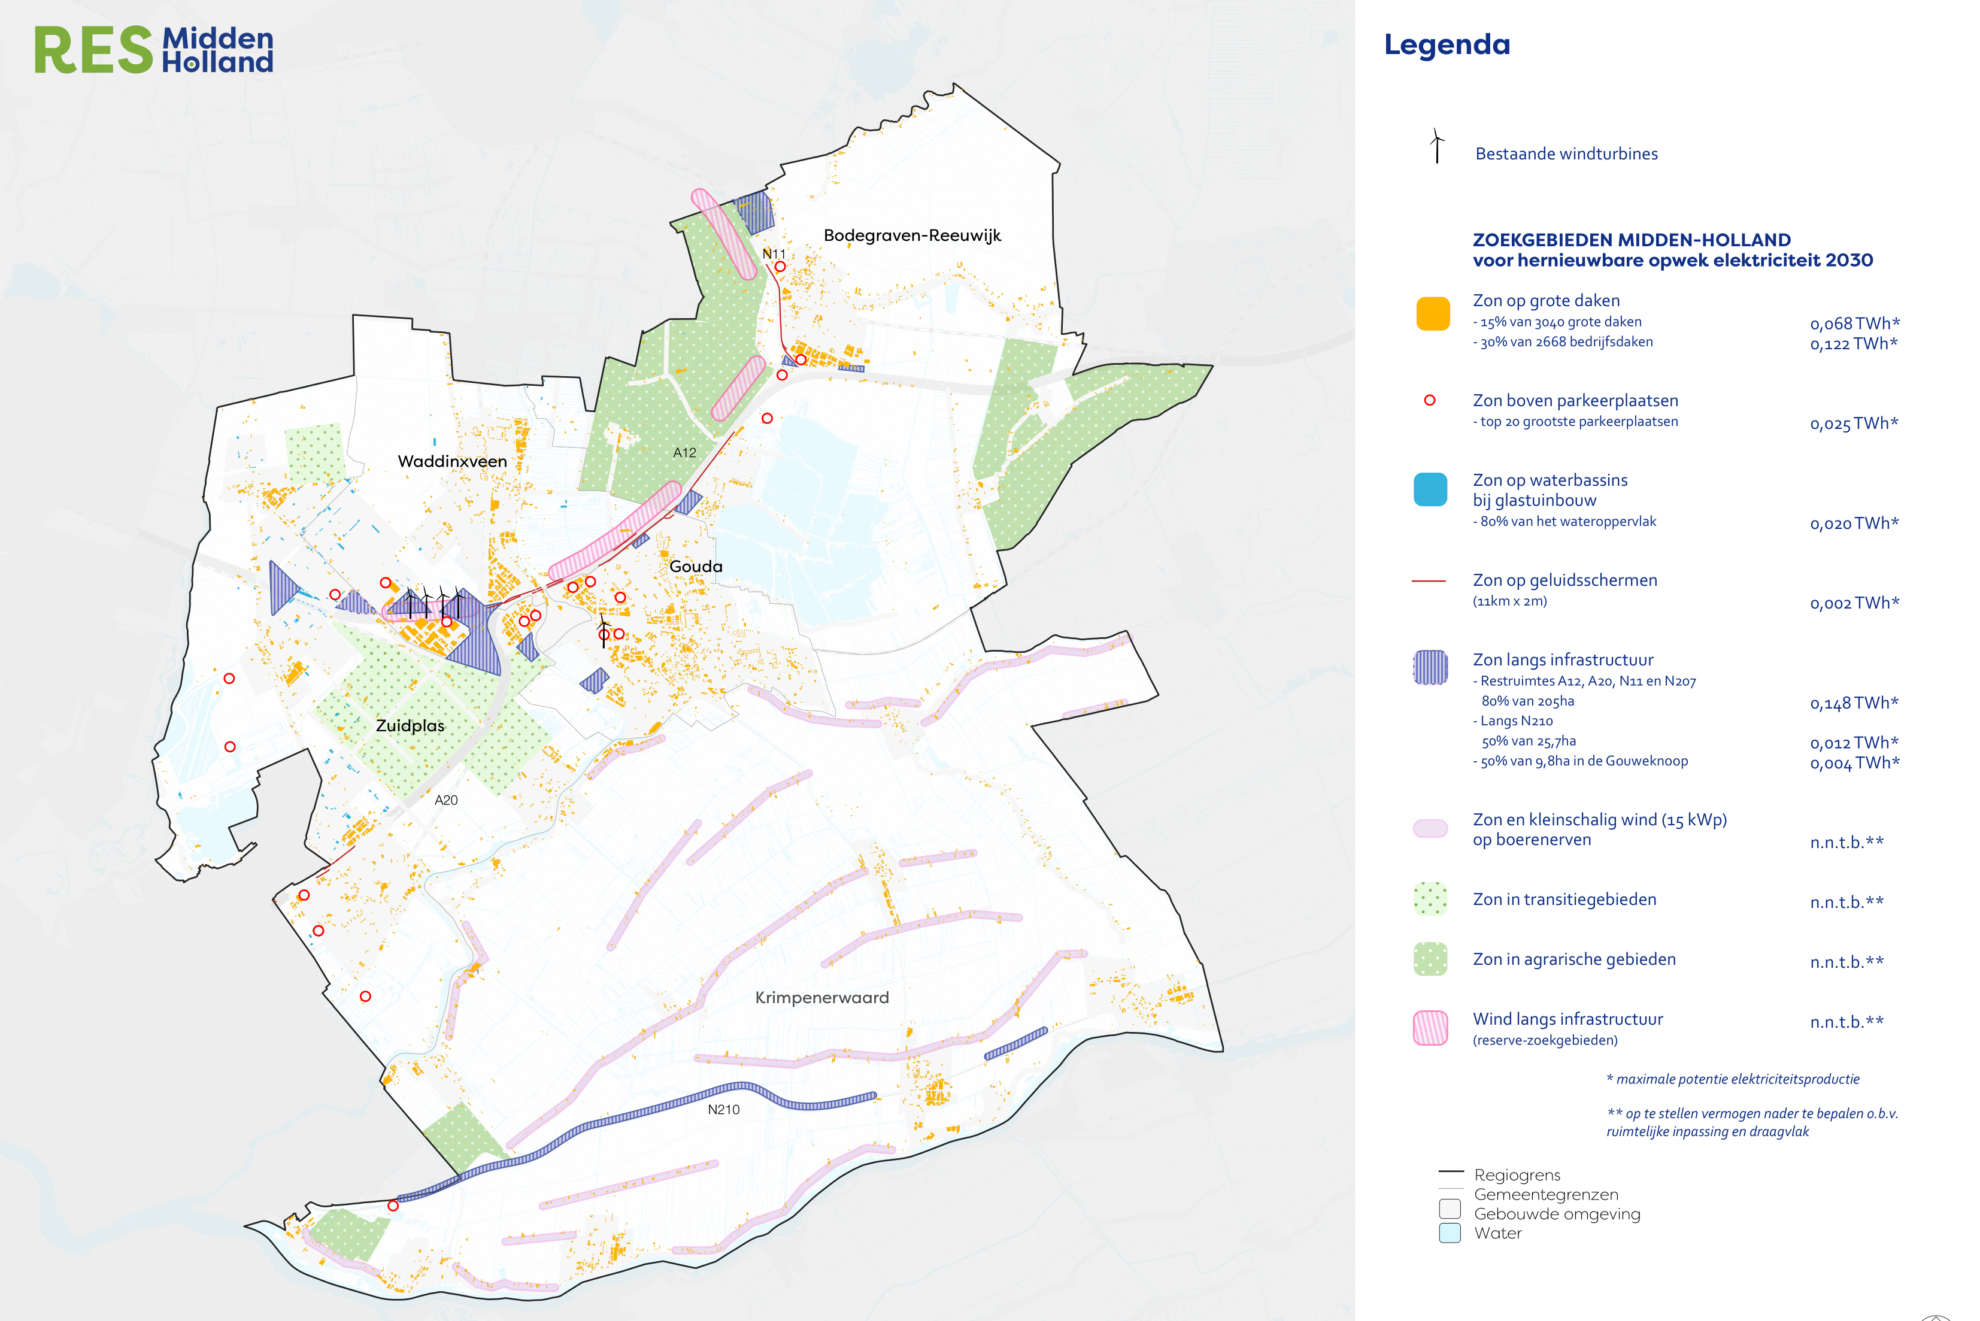 Regio Midden-Holland stelt RES 1.0 vast